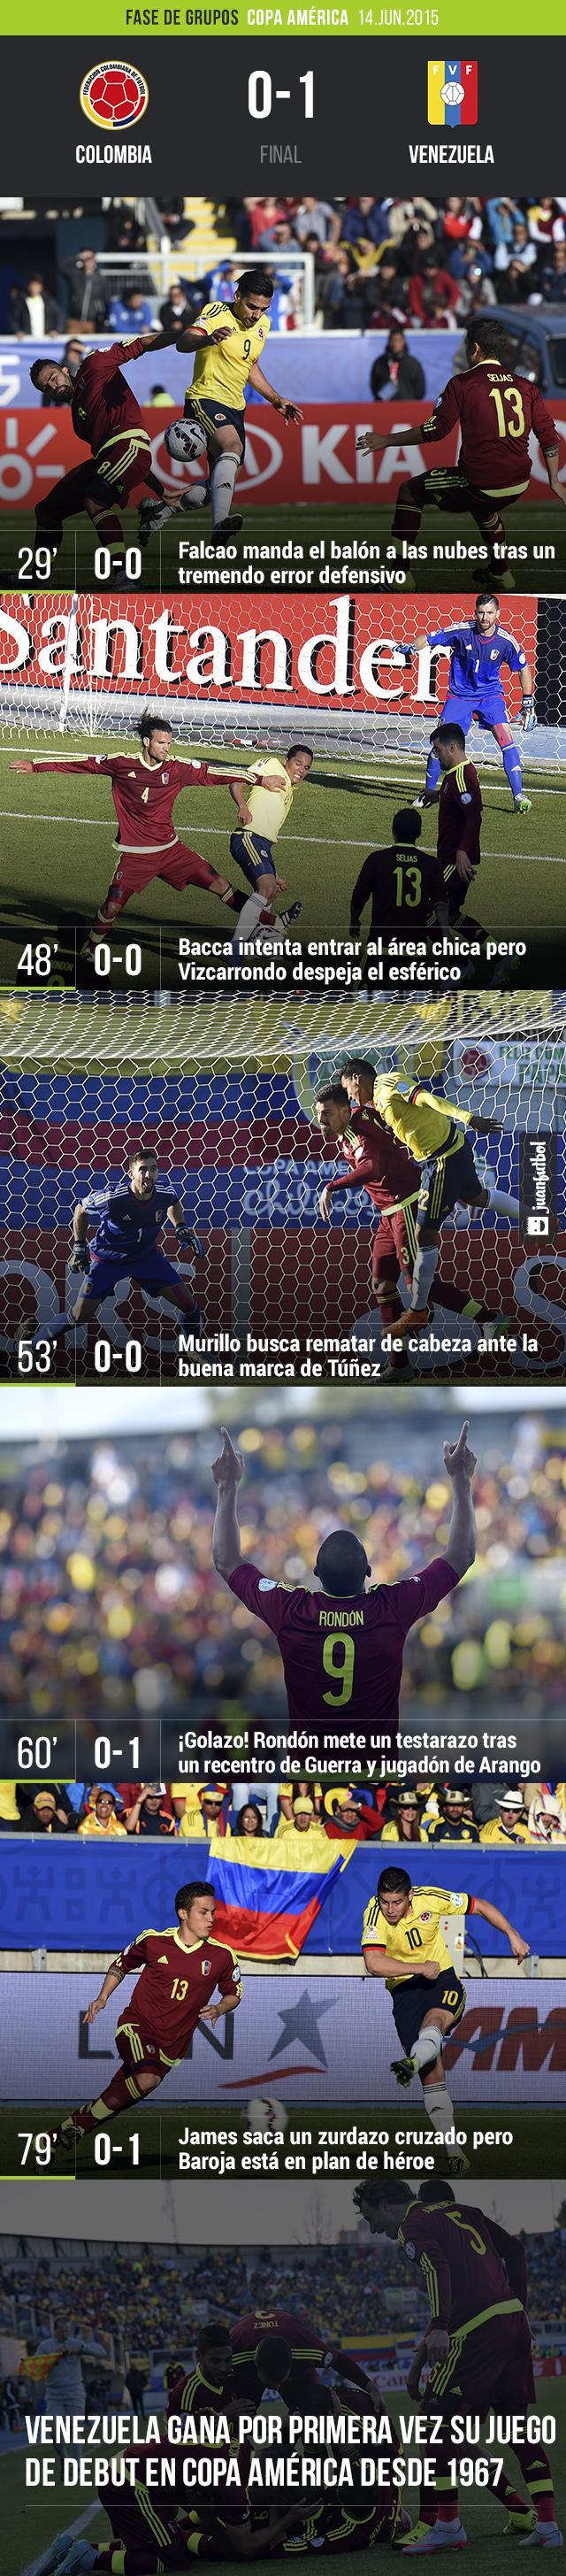 Venezuela vence 1-0 a Colombia en Fase de Grupos de Copa América